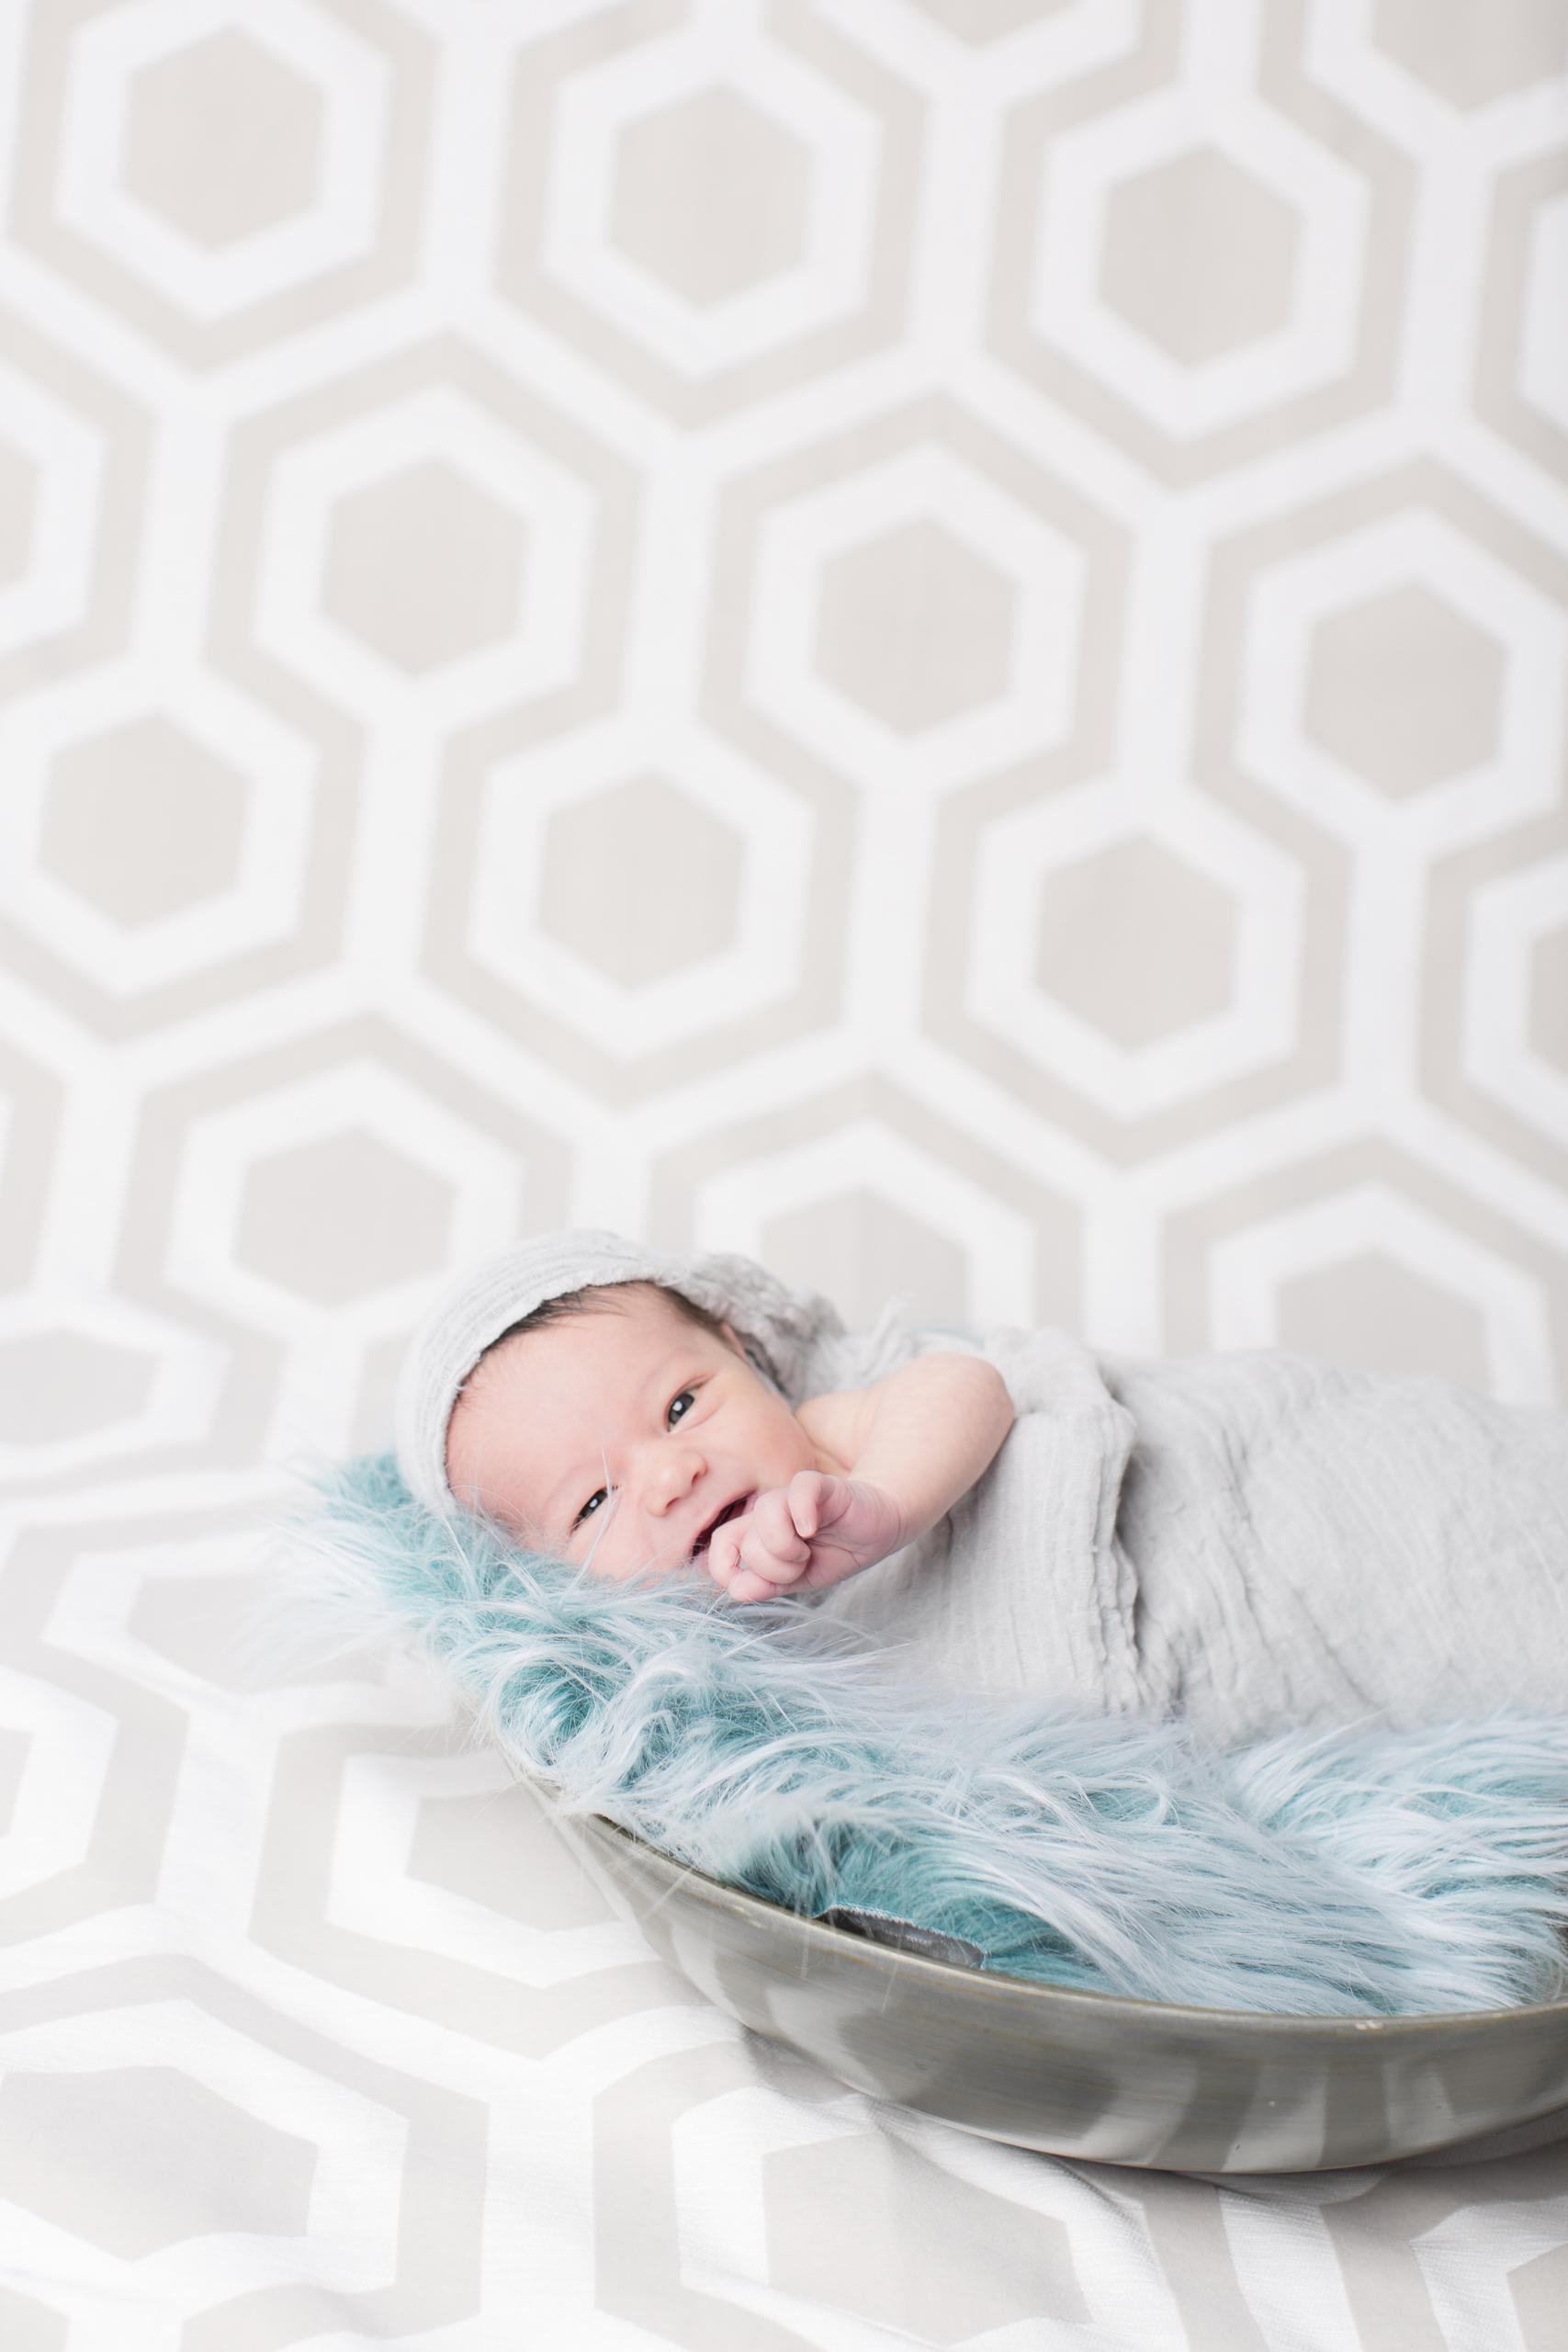 03 modern newborn baby boy blue swaddle in bowl modern hexagon backdrop studio photography session.jpg